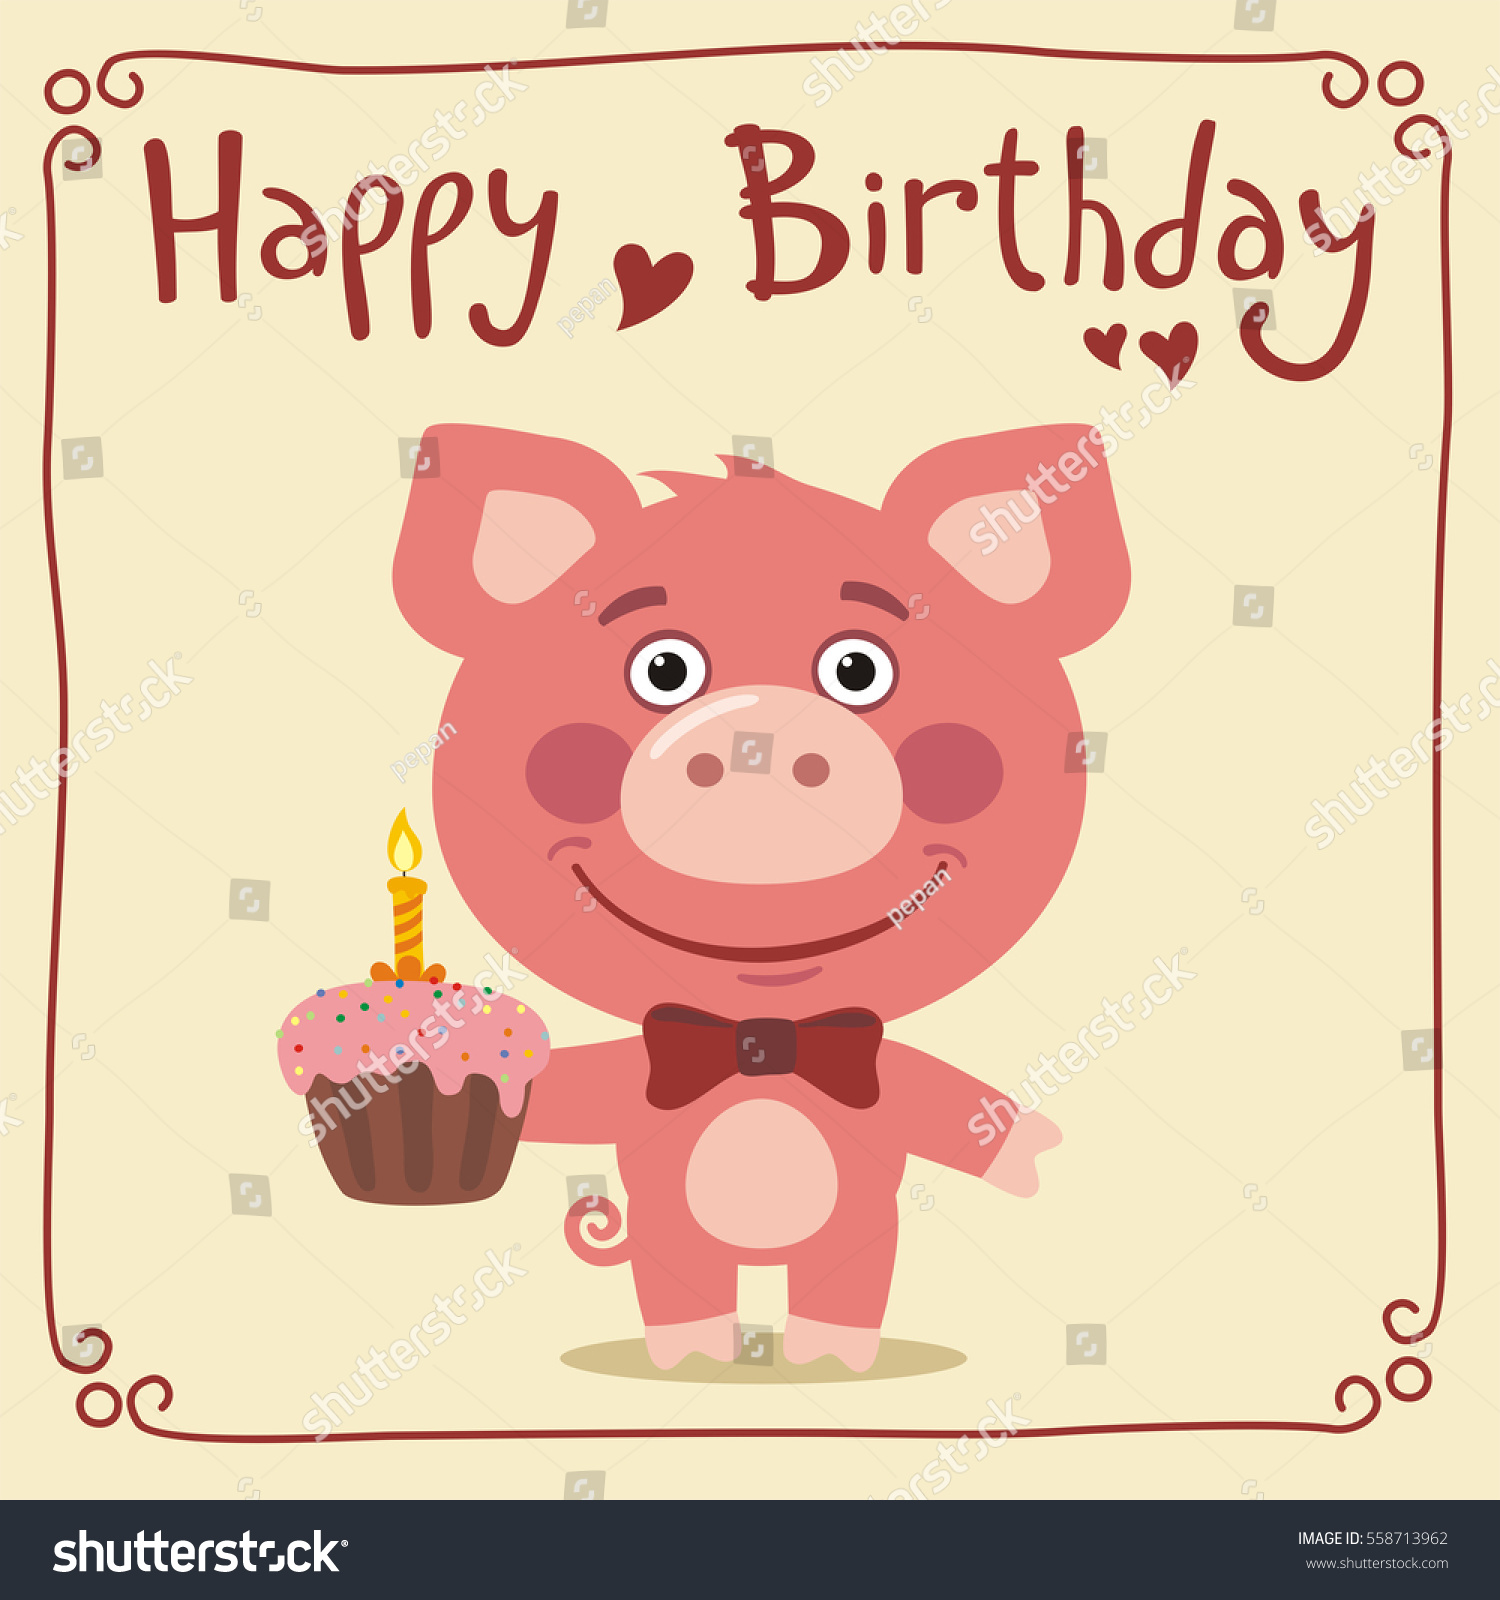 happy birthday funny pig birthday cake stock vector 558713962